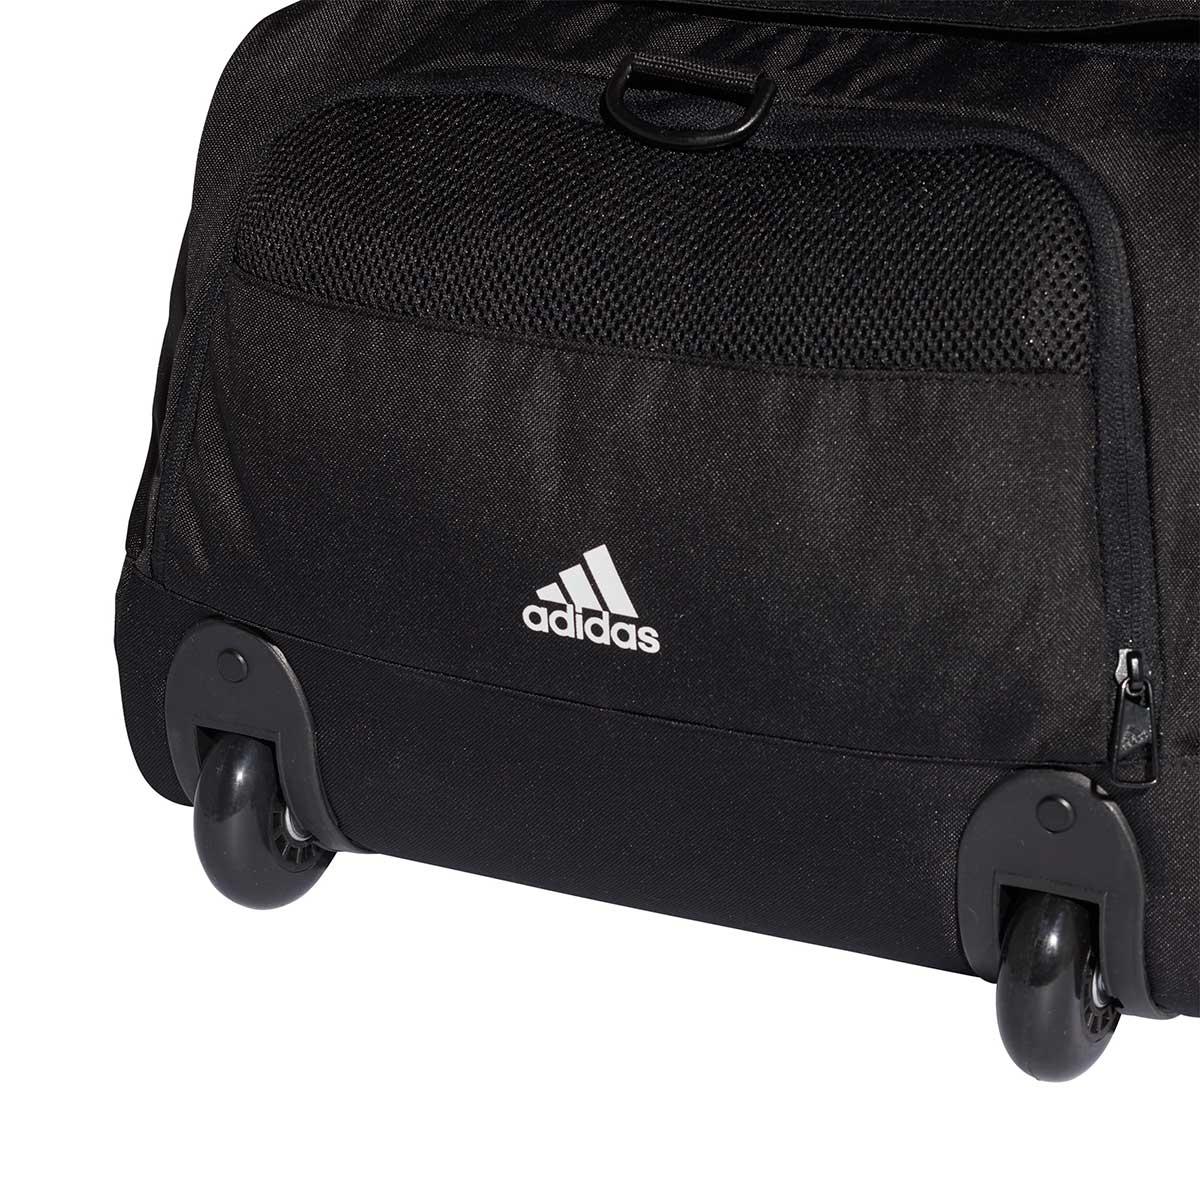 Adidas Medium Wheelie Duffel Bag